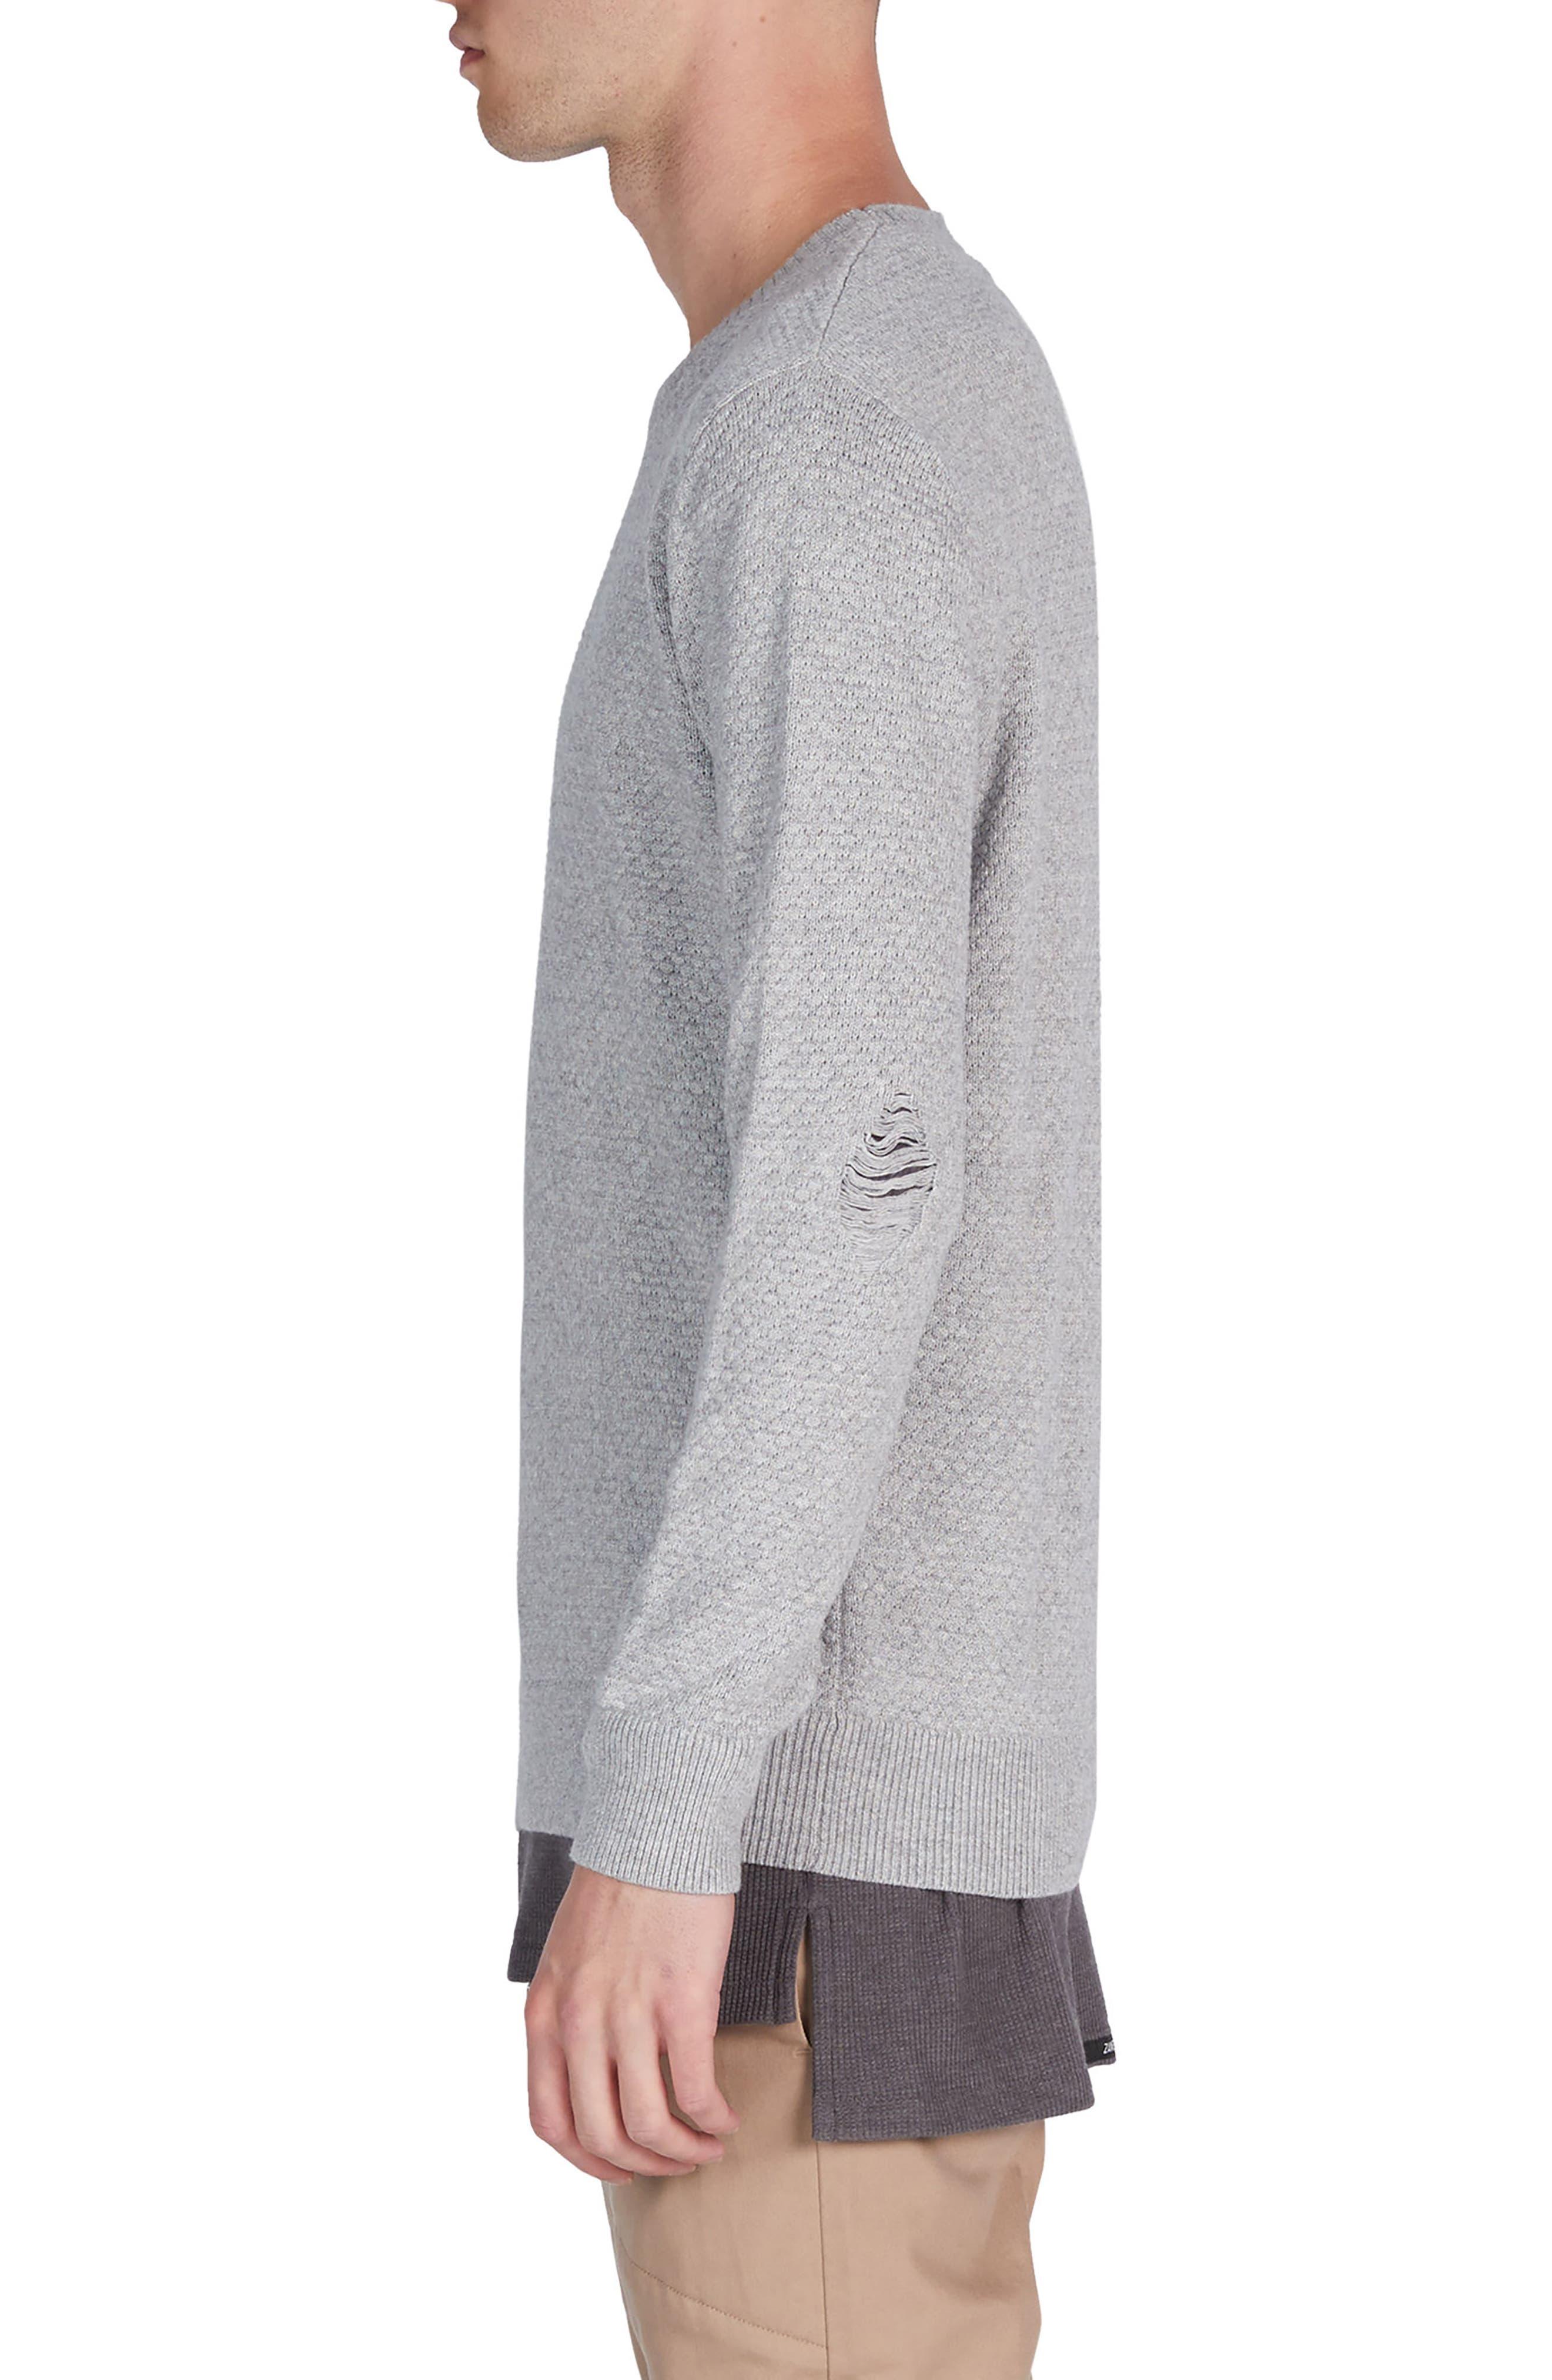 Grip Crewneck Sweater,                             Alternate thumbnail 3, color,                             030